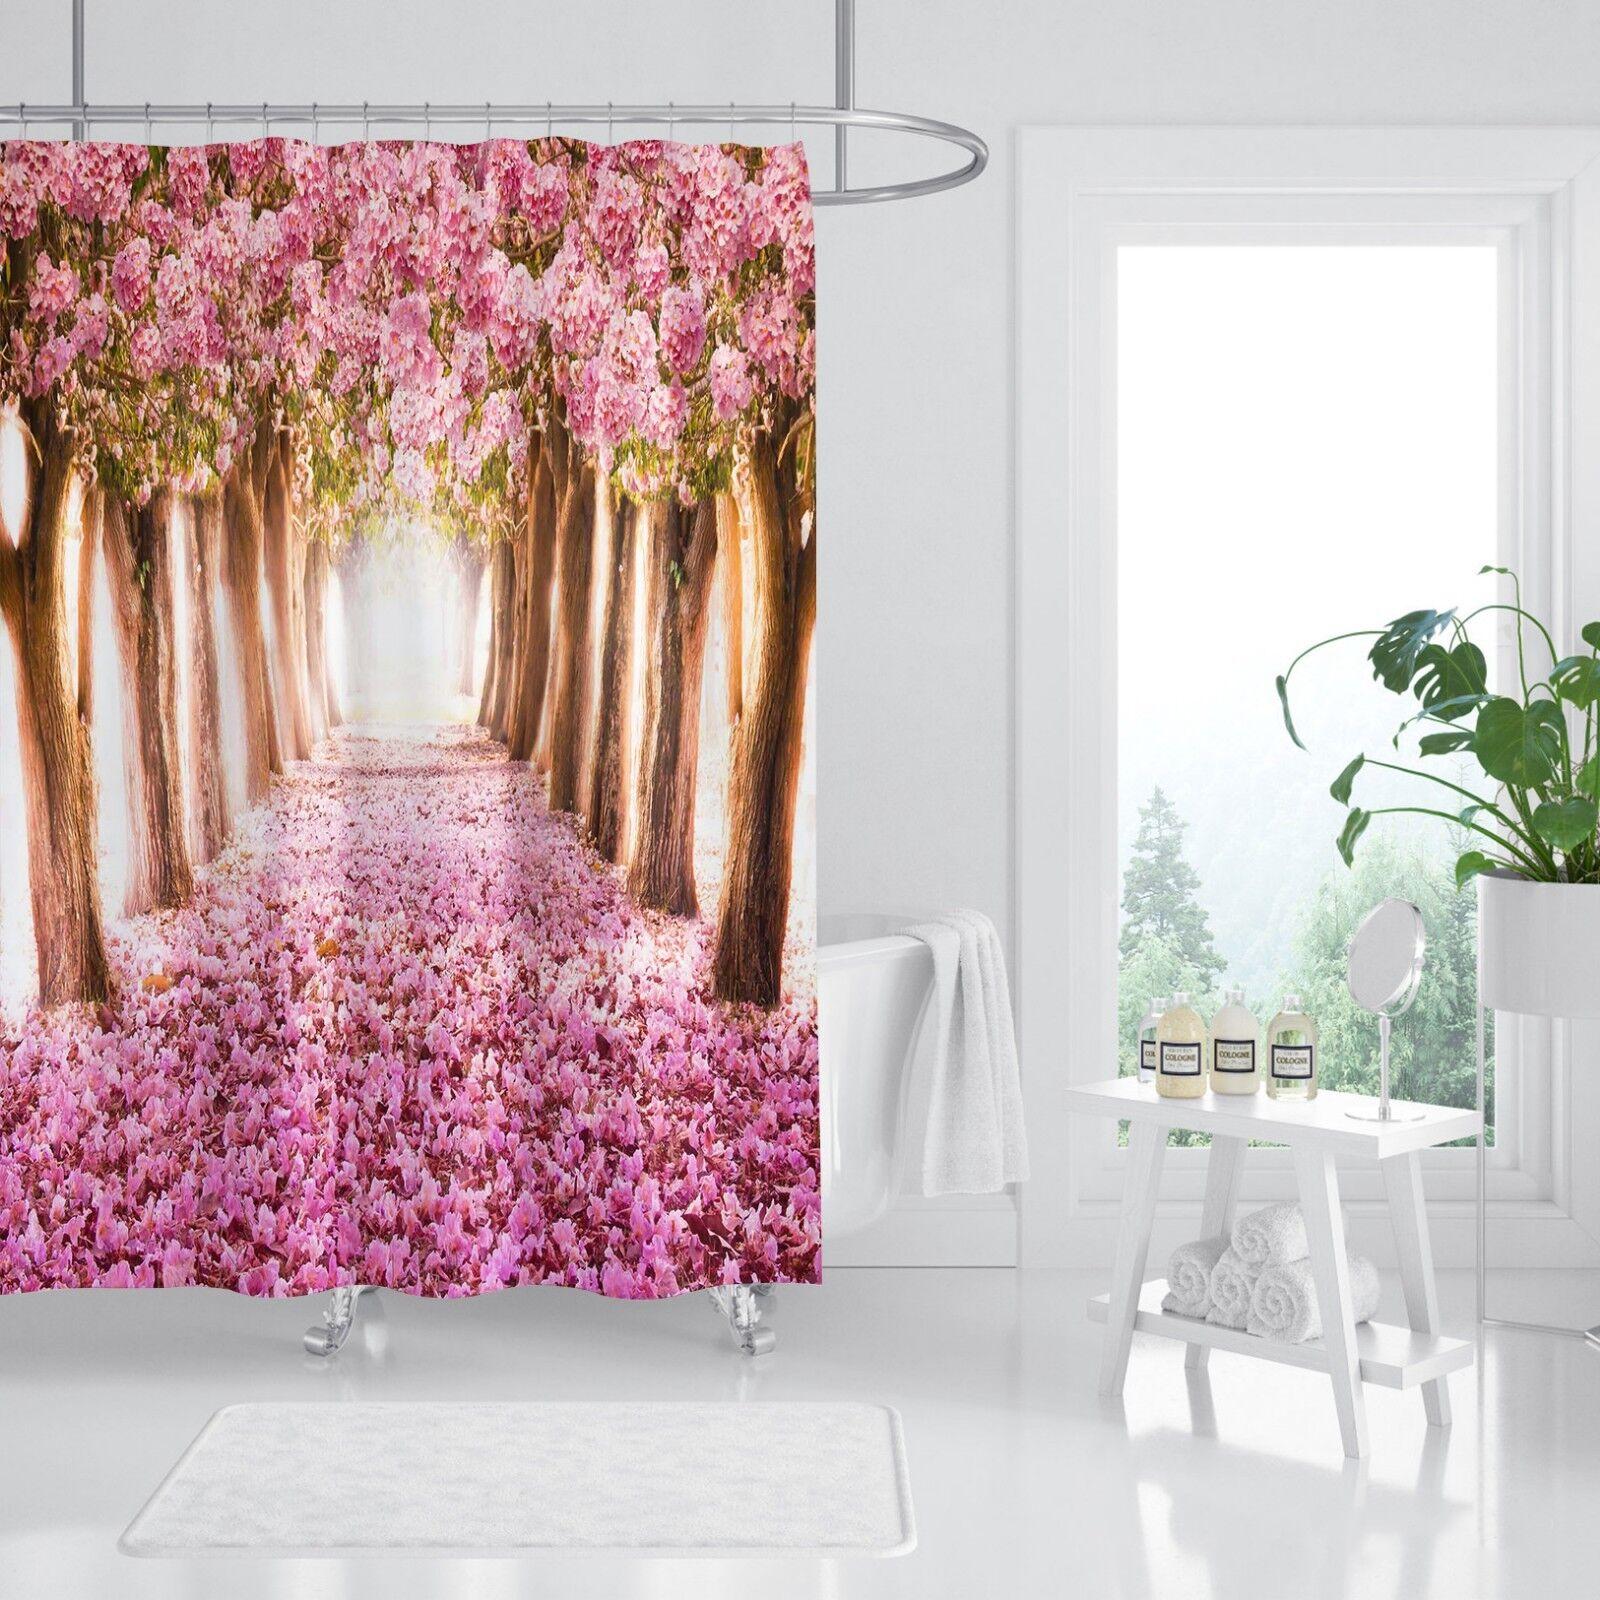 3D rose Petal boiss 7 Shower Curtain imperméable Fiber Bathroom  Window Toilet